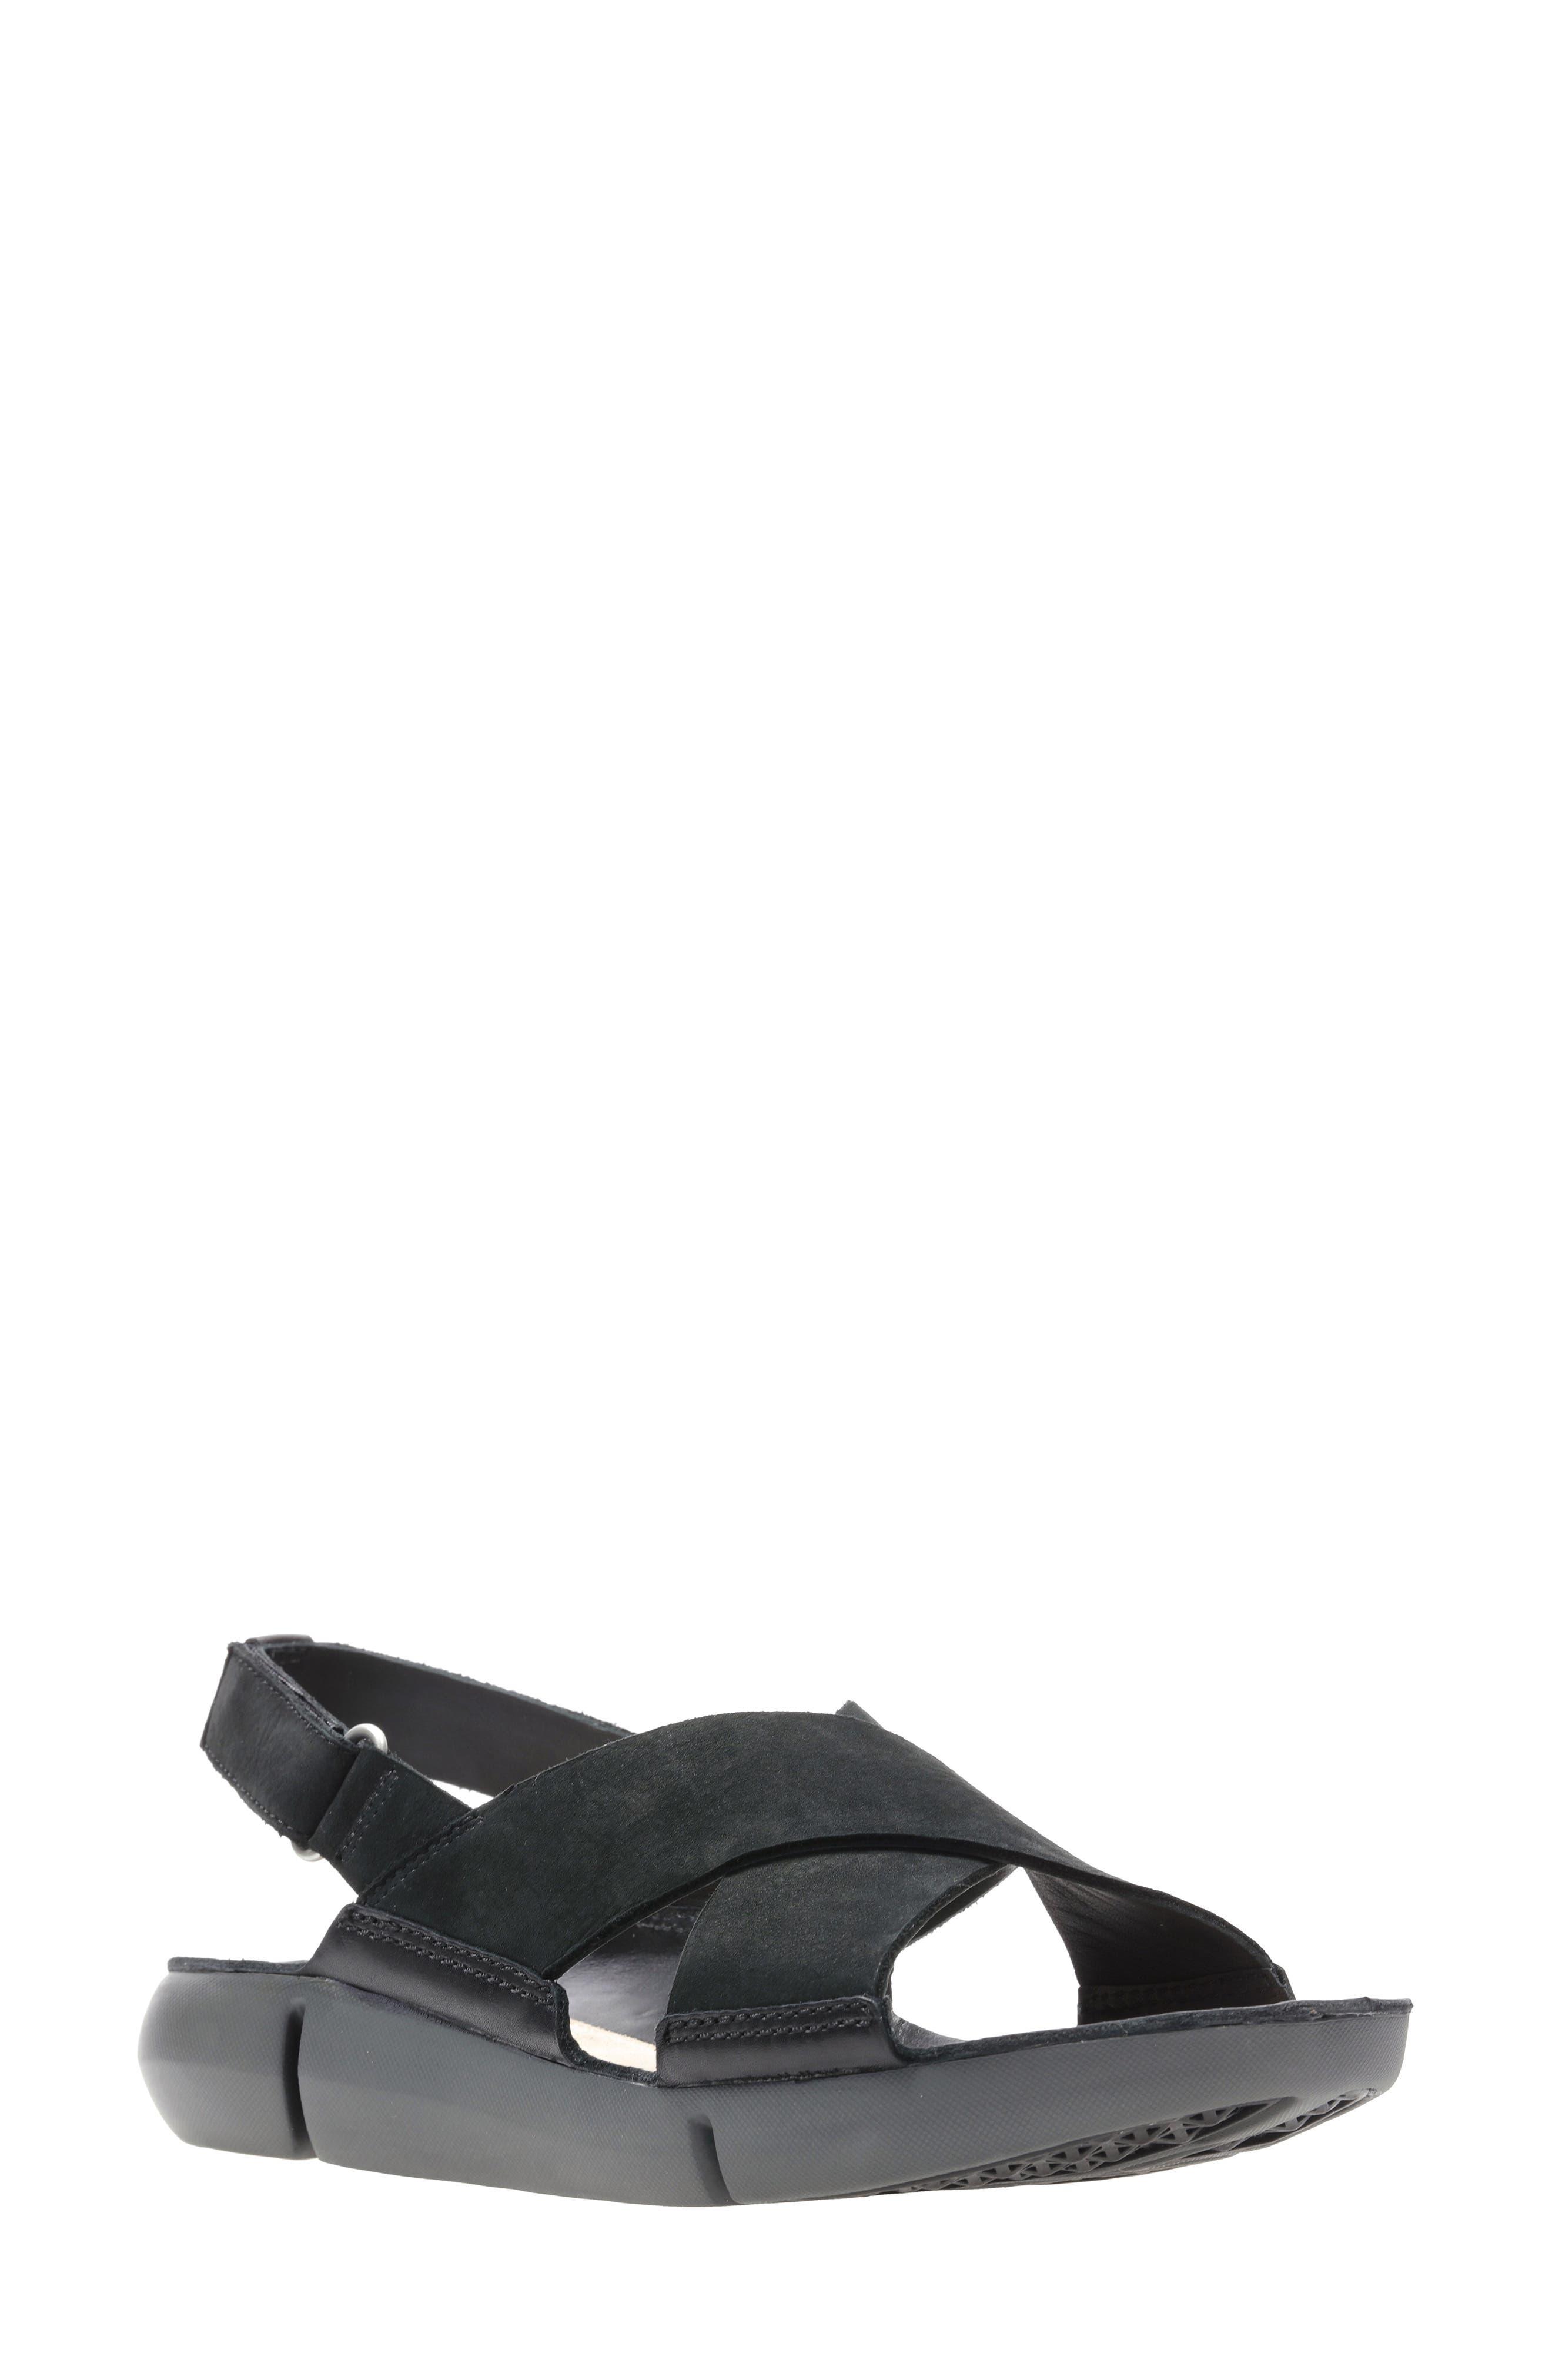 CLARKS<SUP>®</SUP> Tri Chloe Sandal, Main, color, BLACK/ BLACK NUBUCK